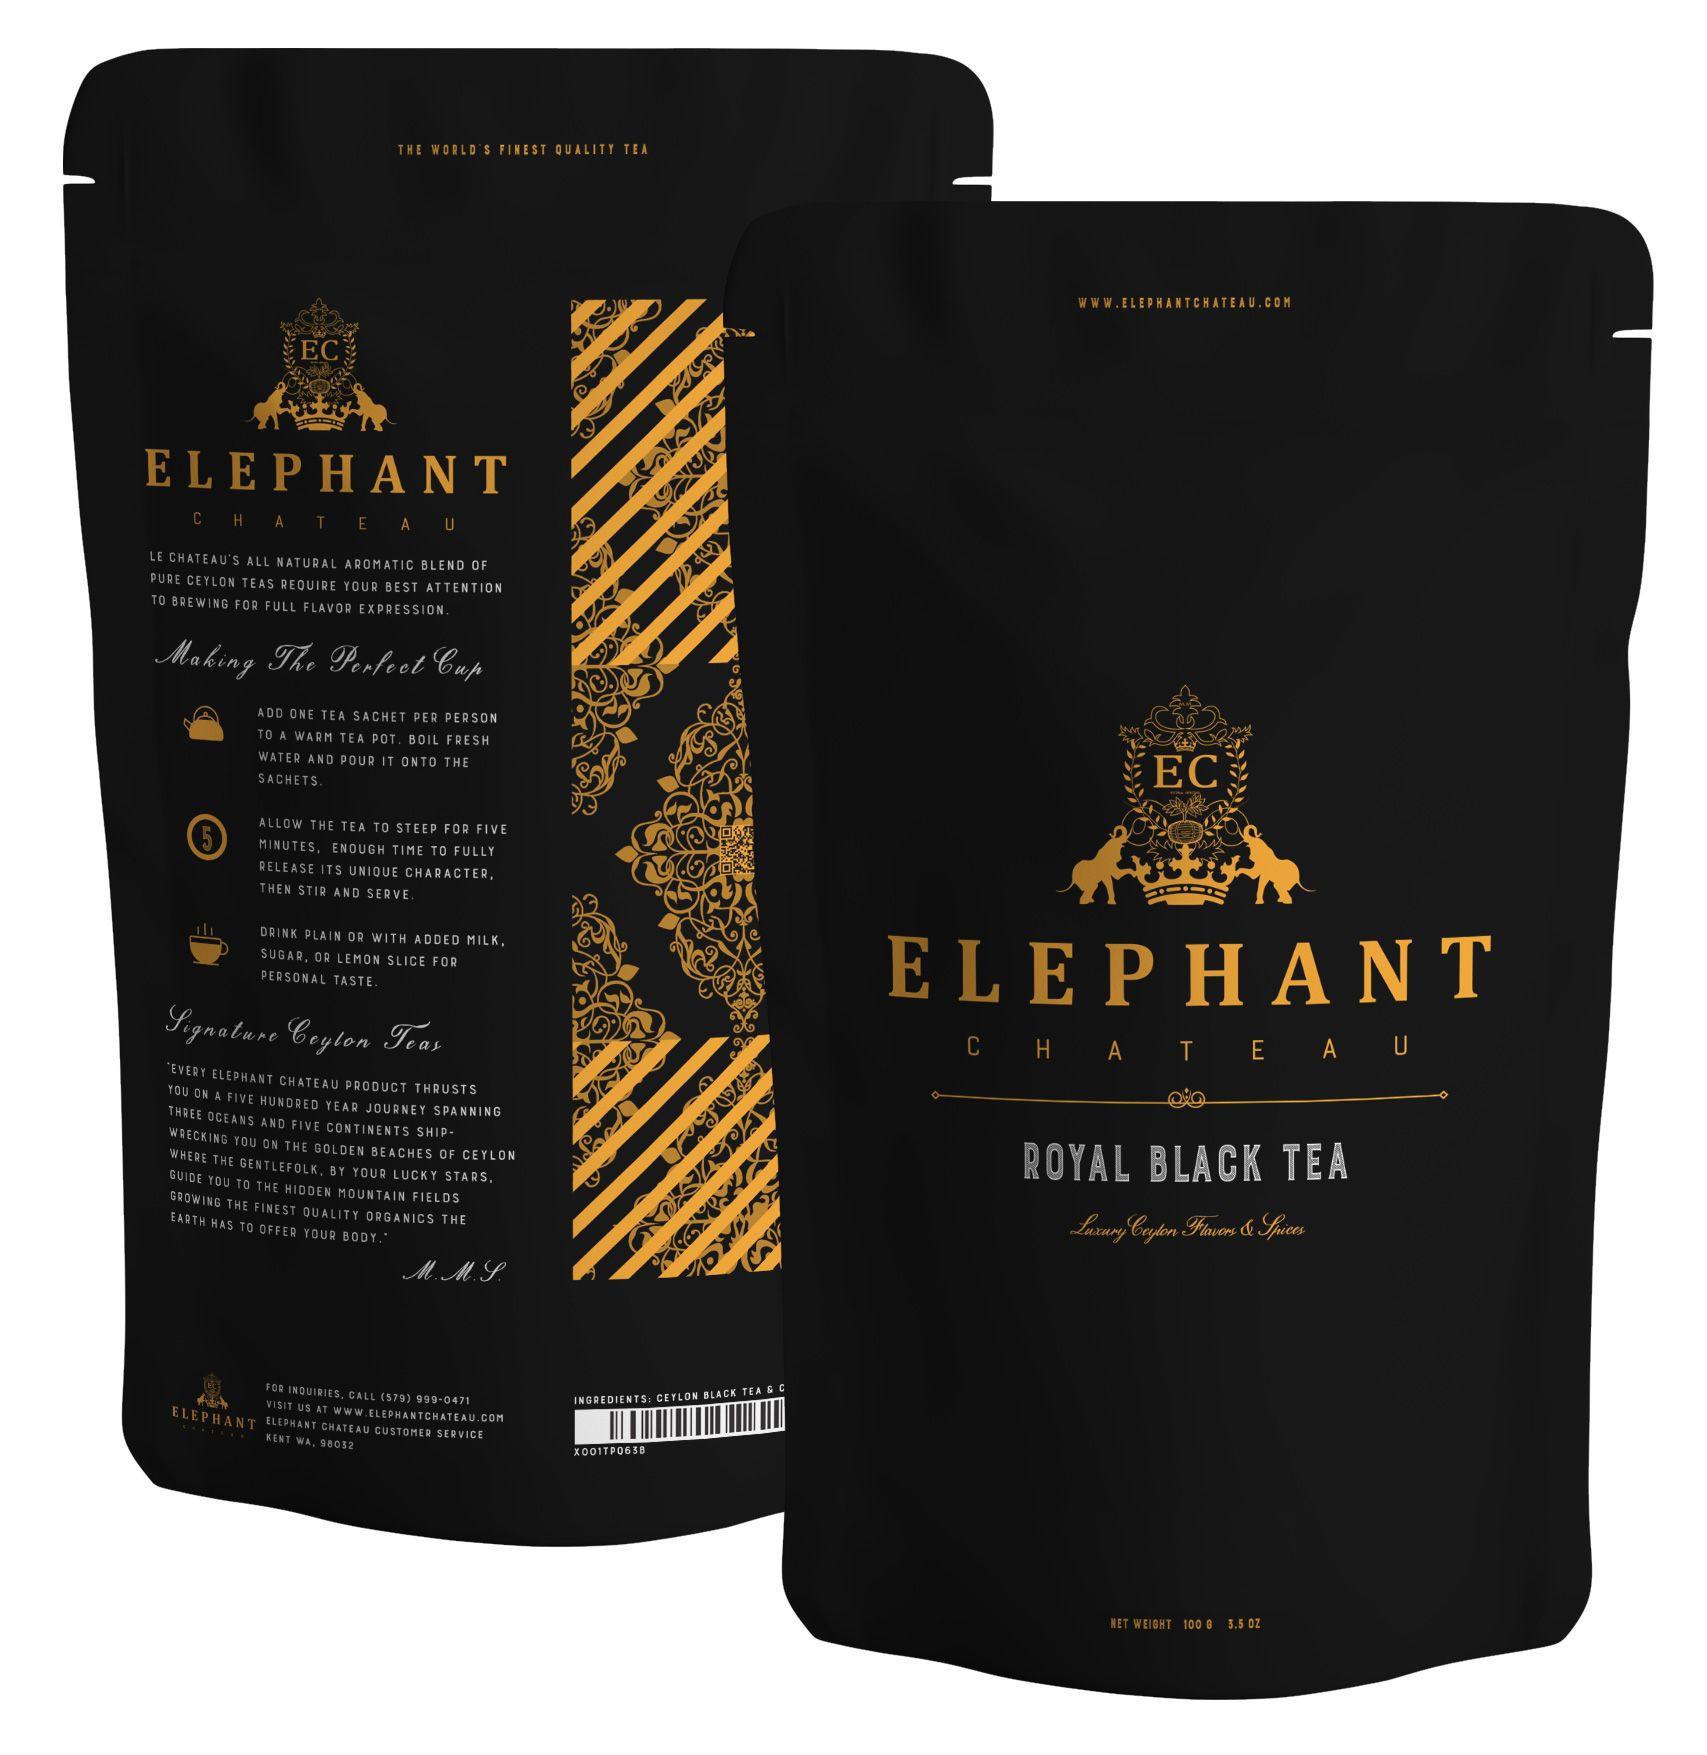 Royal Black Tea | Extra Special Ceylon Loose Leaf | English Breakfast | Smooth & Malty Teas | Aromatic Leaves